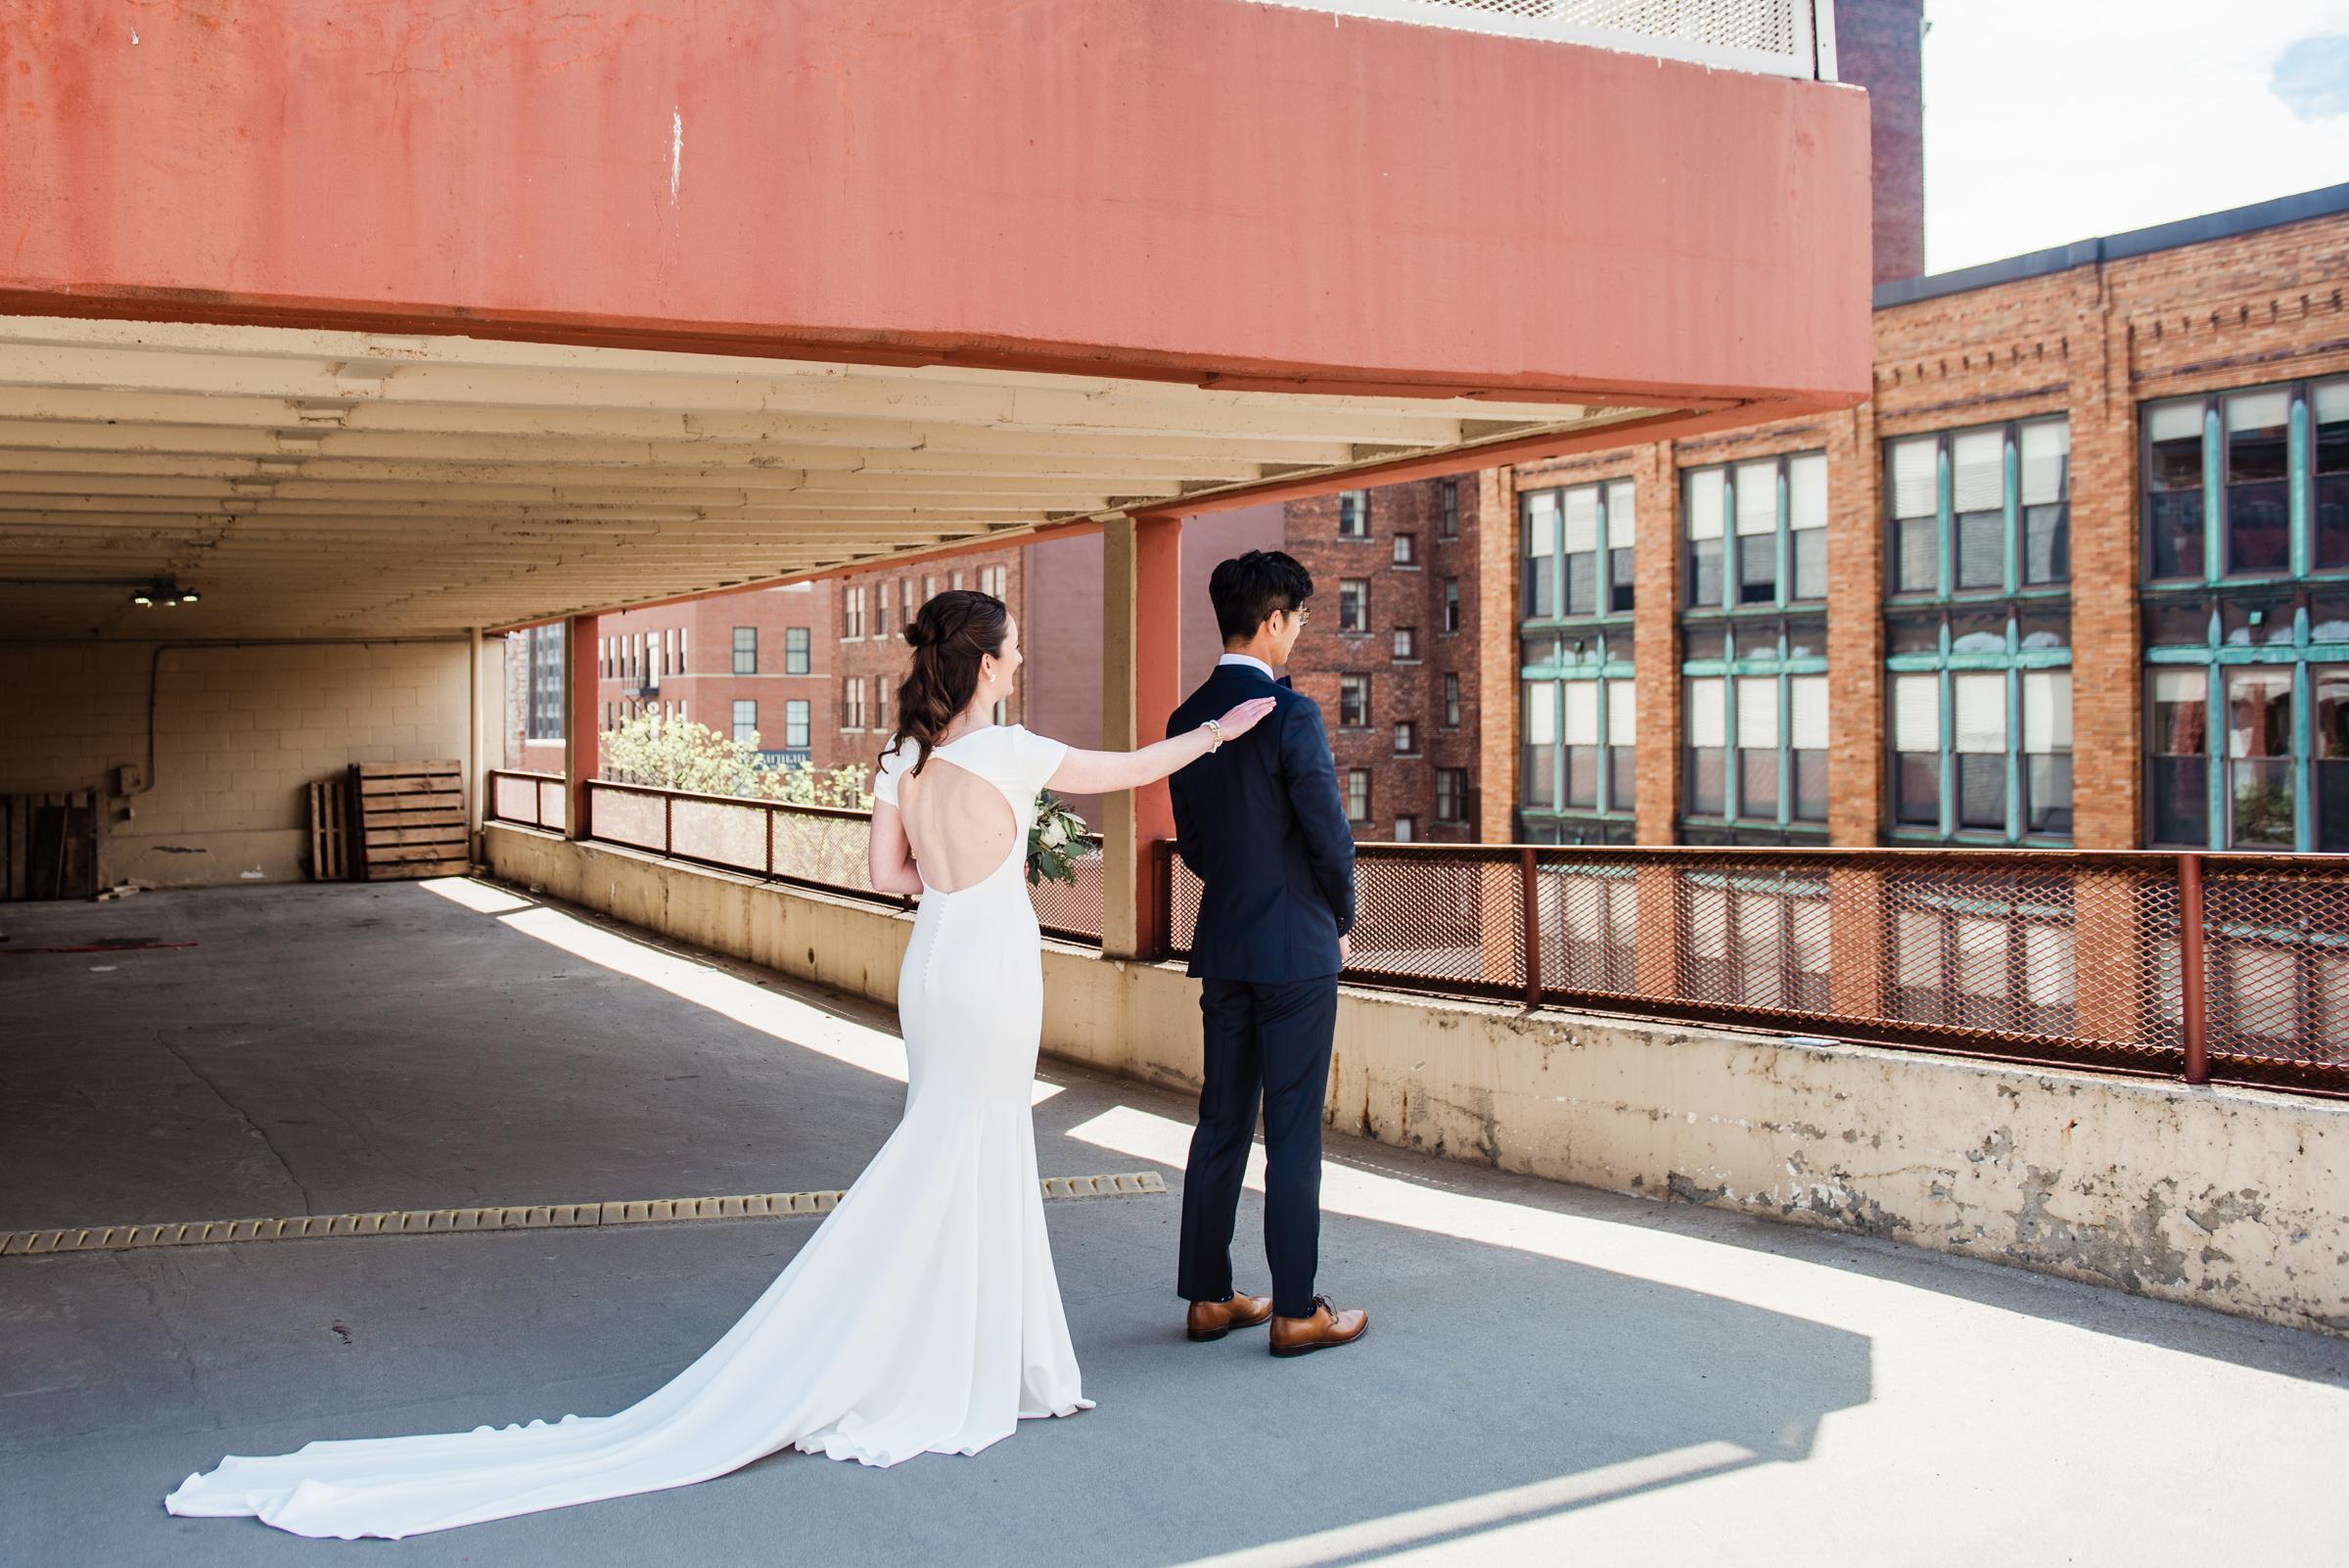 SKY_Armory_Syracuse_Wedding_JILL_STUDIO_Rochester_NY_Photographer_DSC_5187.jpg